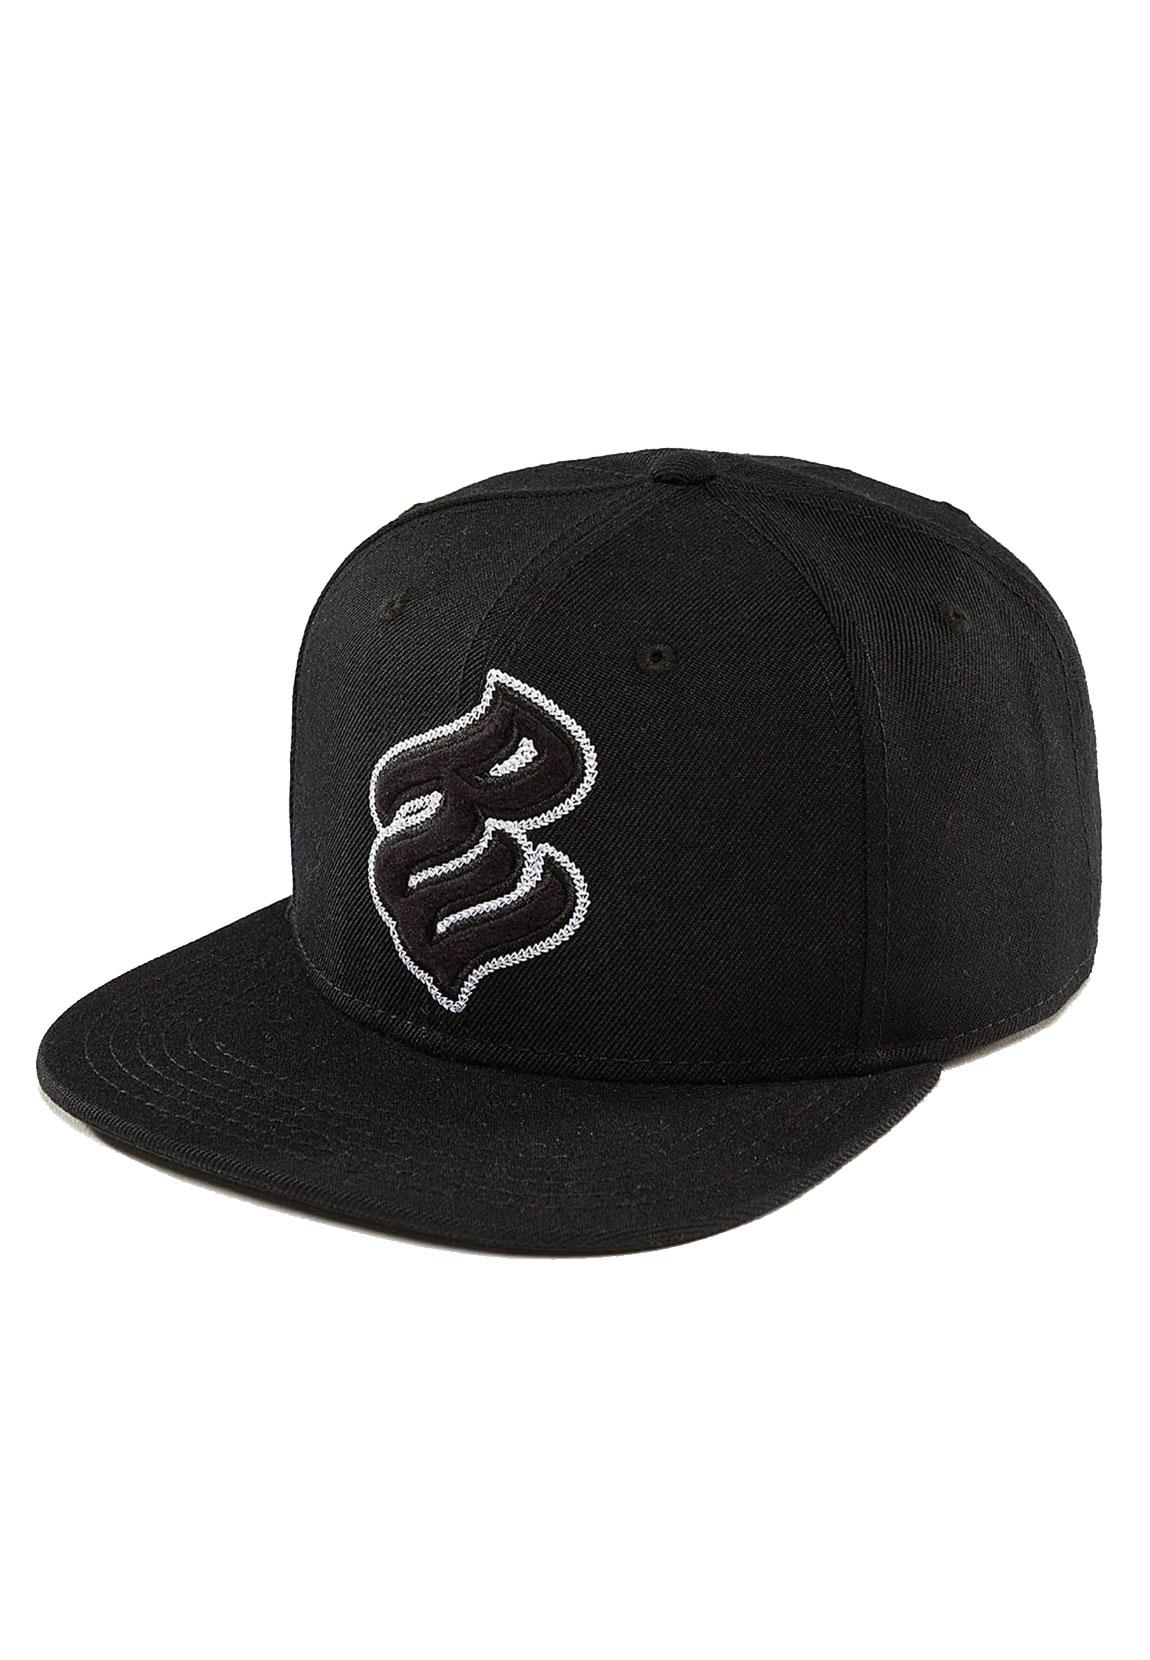 rocawear cap herren big logo rwca008blk schwarz black. Black Bedroom Furniture Sets. Home Design Ideas